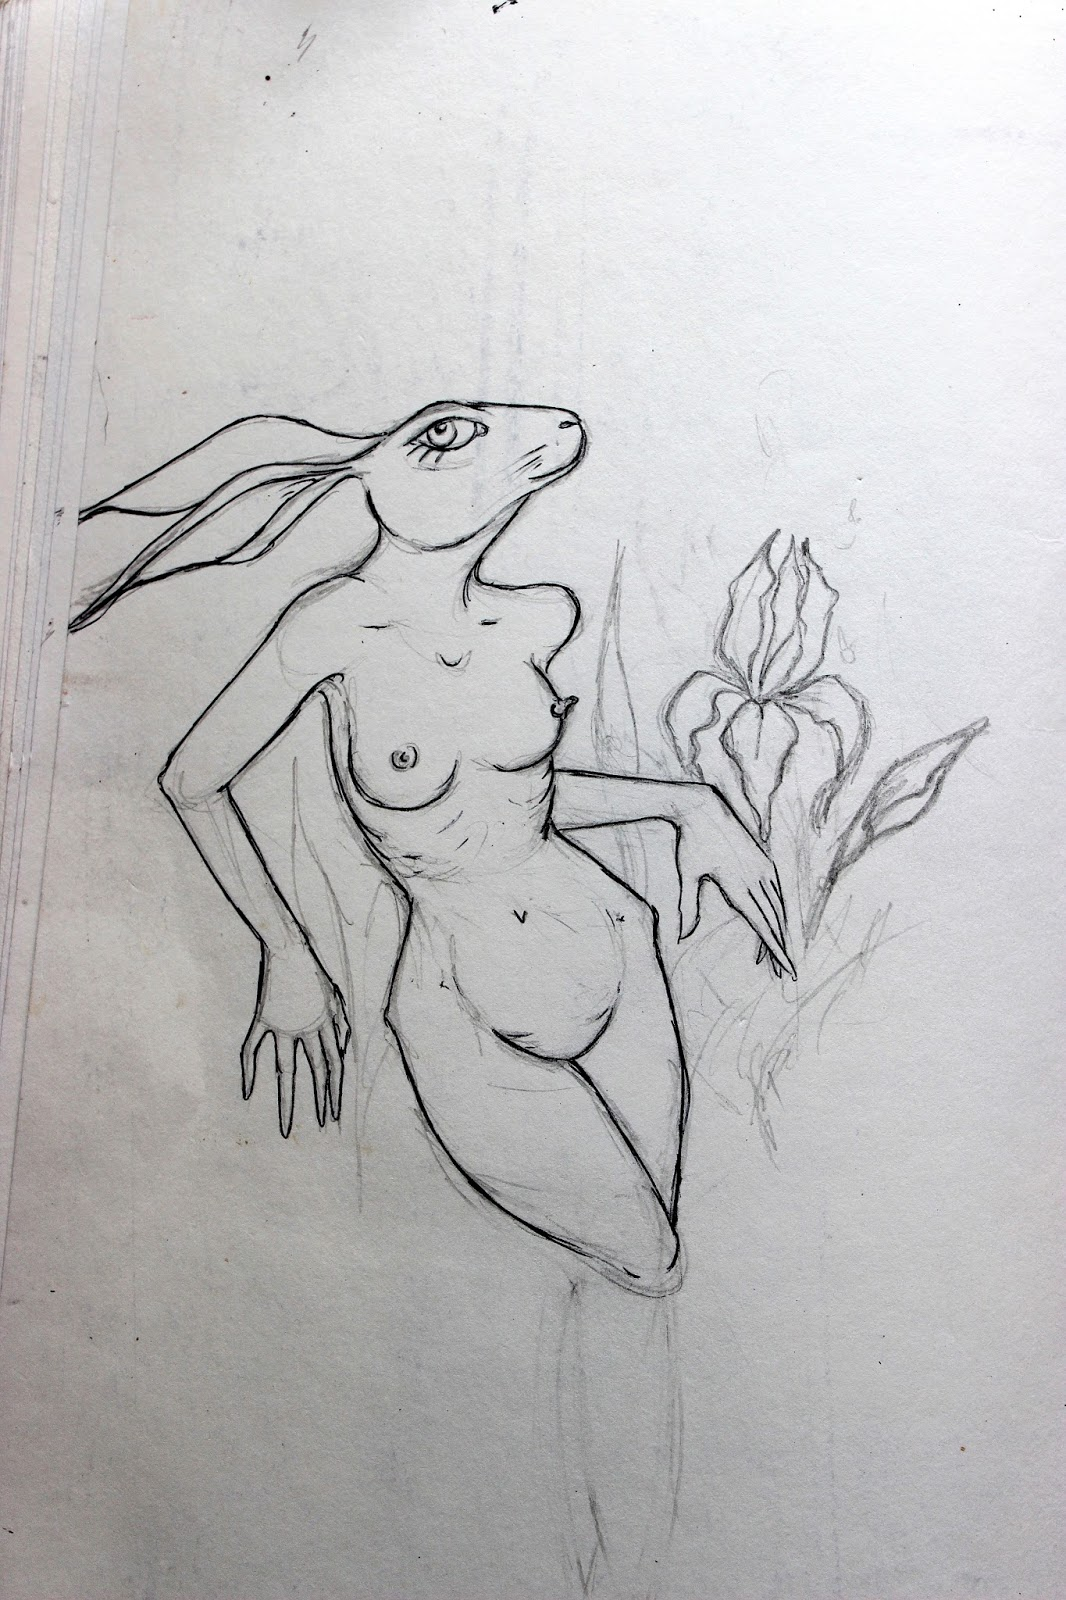 Sketchpad Notebook Sketch Drawing Pencil Rabbit Naked Woman Boobs